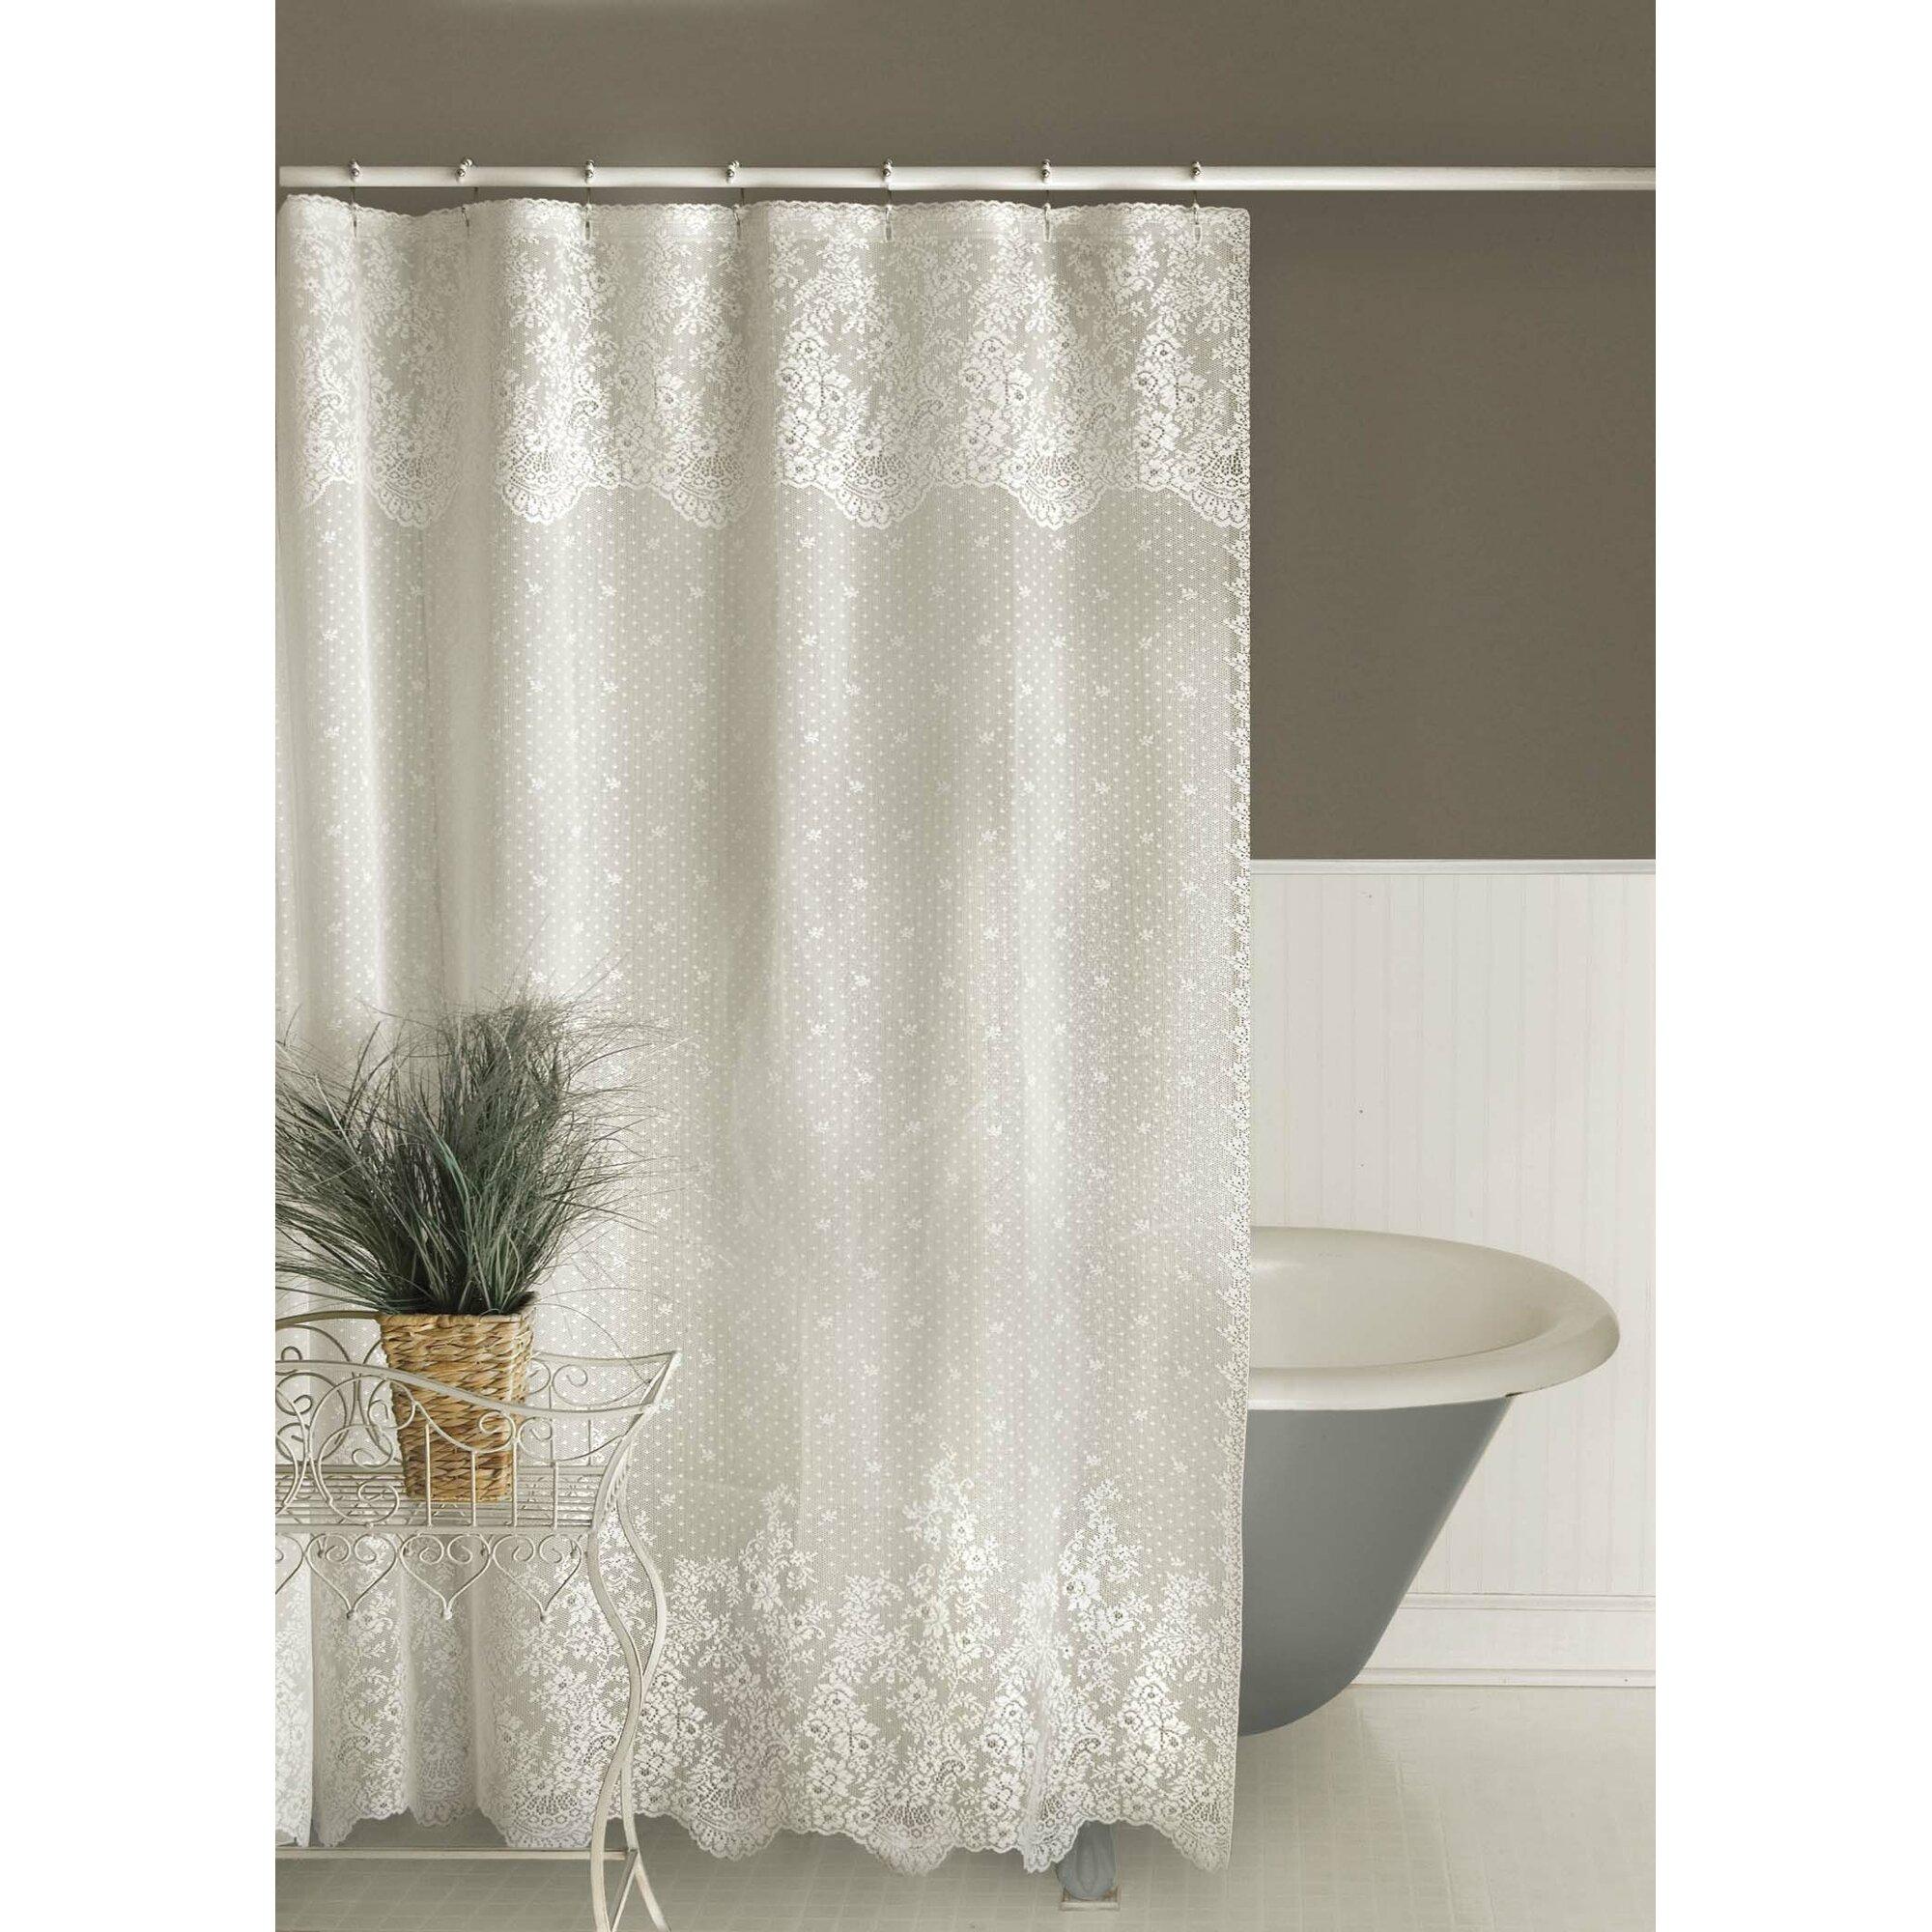 Astoria Grand Victor Shower Curtain  Reviews Wayfair - Beige and gray shower curtain